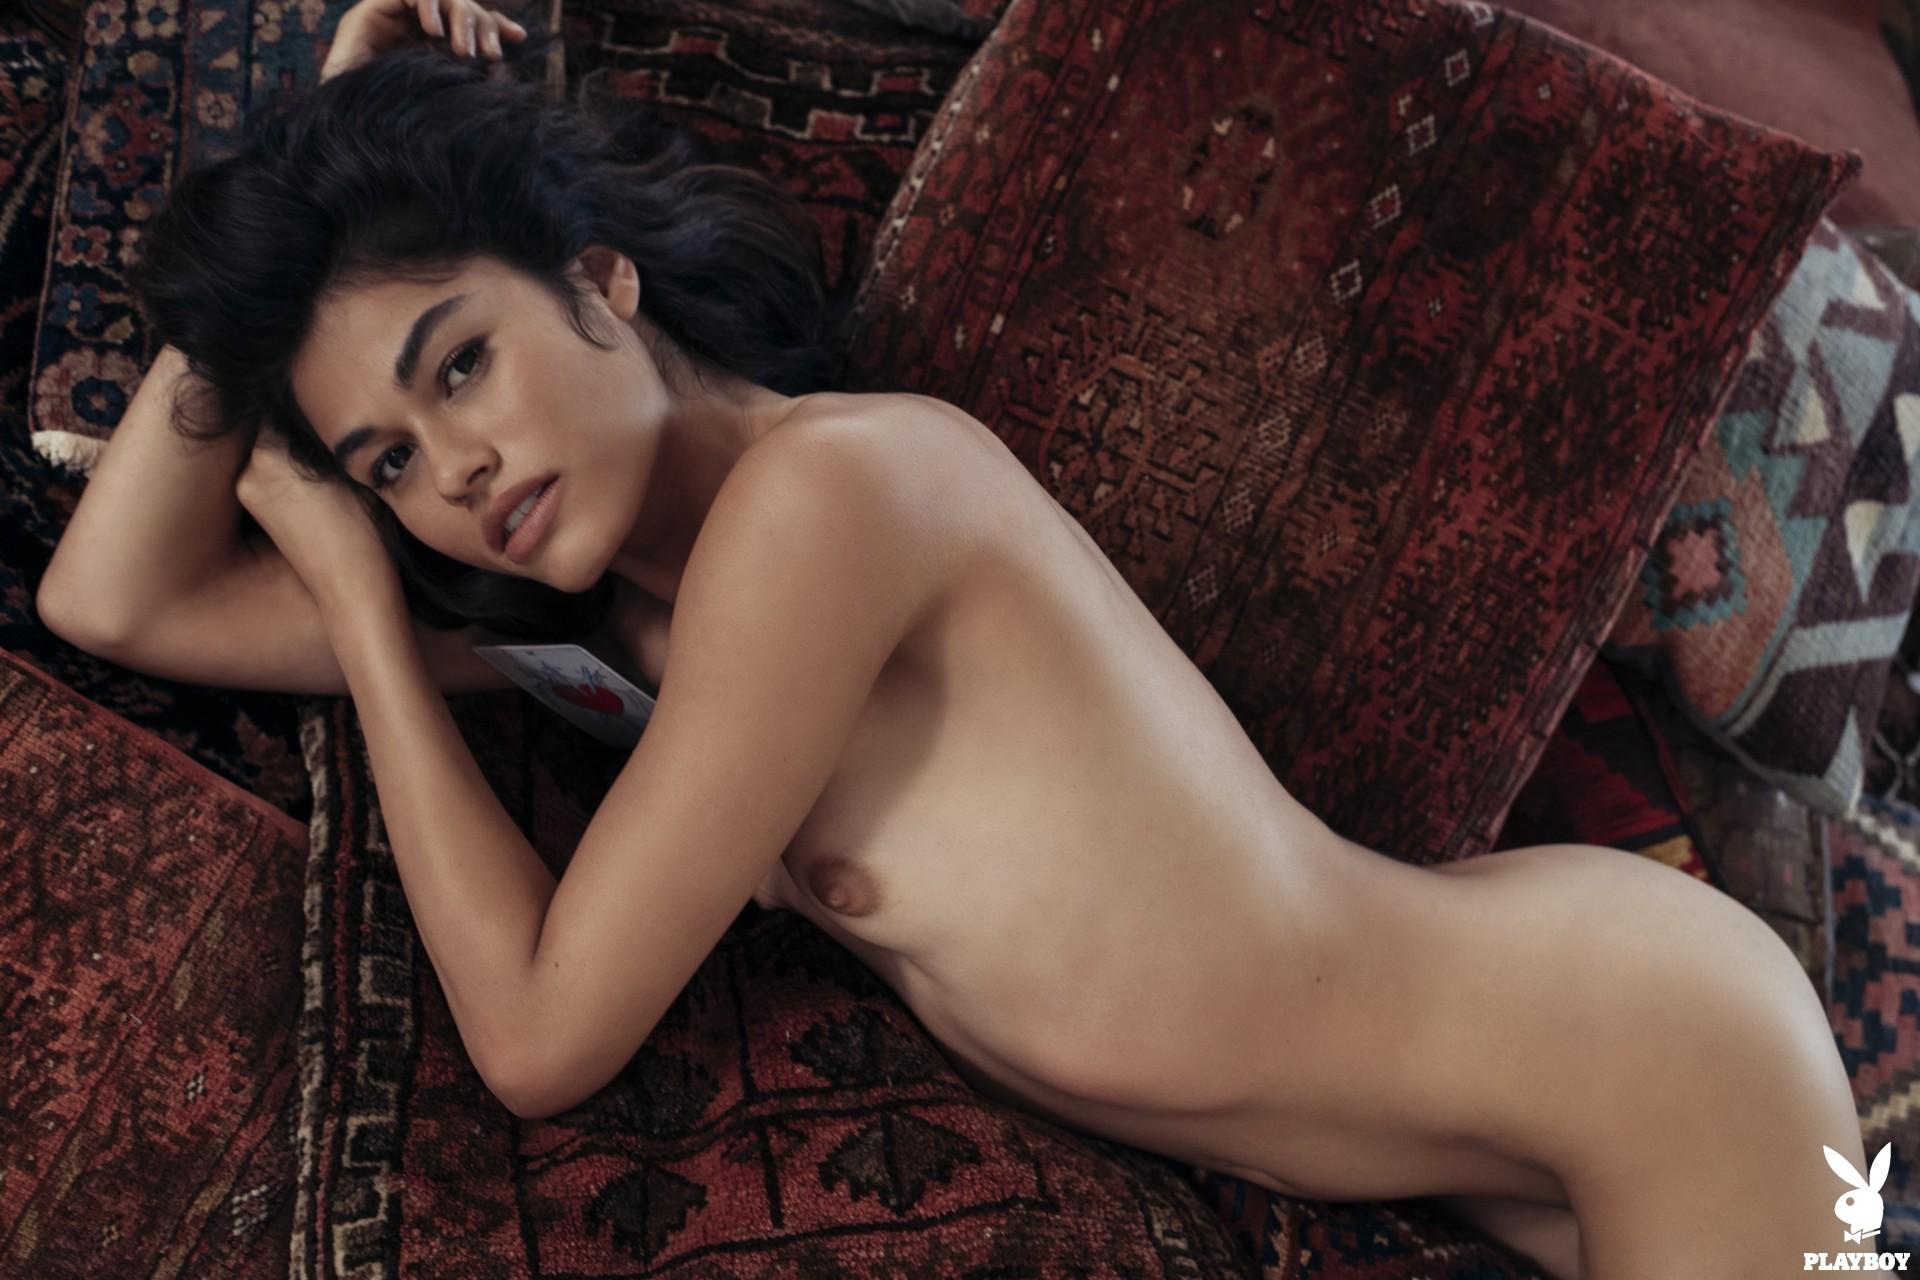 Playmate August 2018: Lorena Medina - Playboy Plus 31